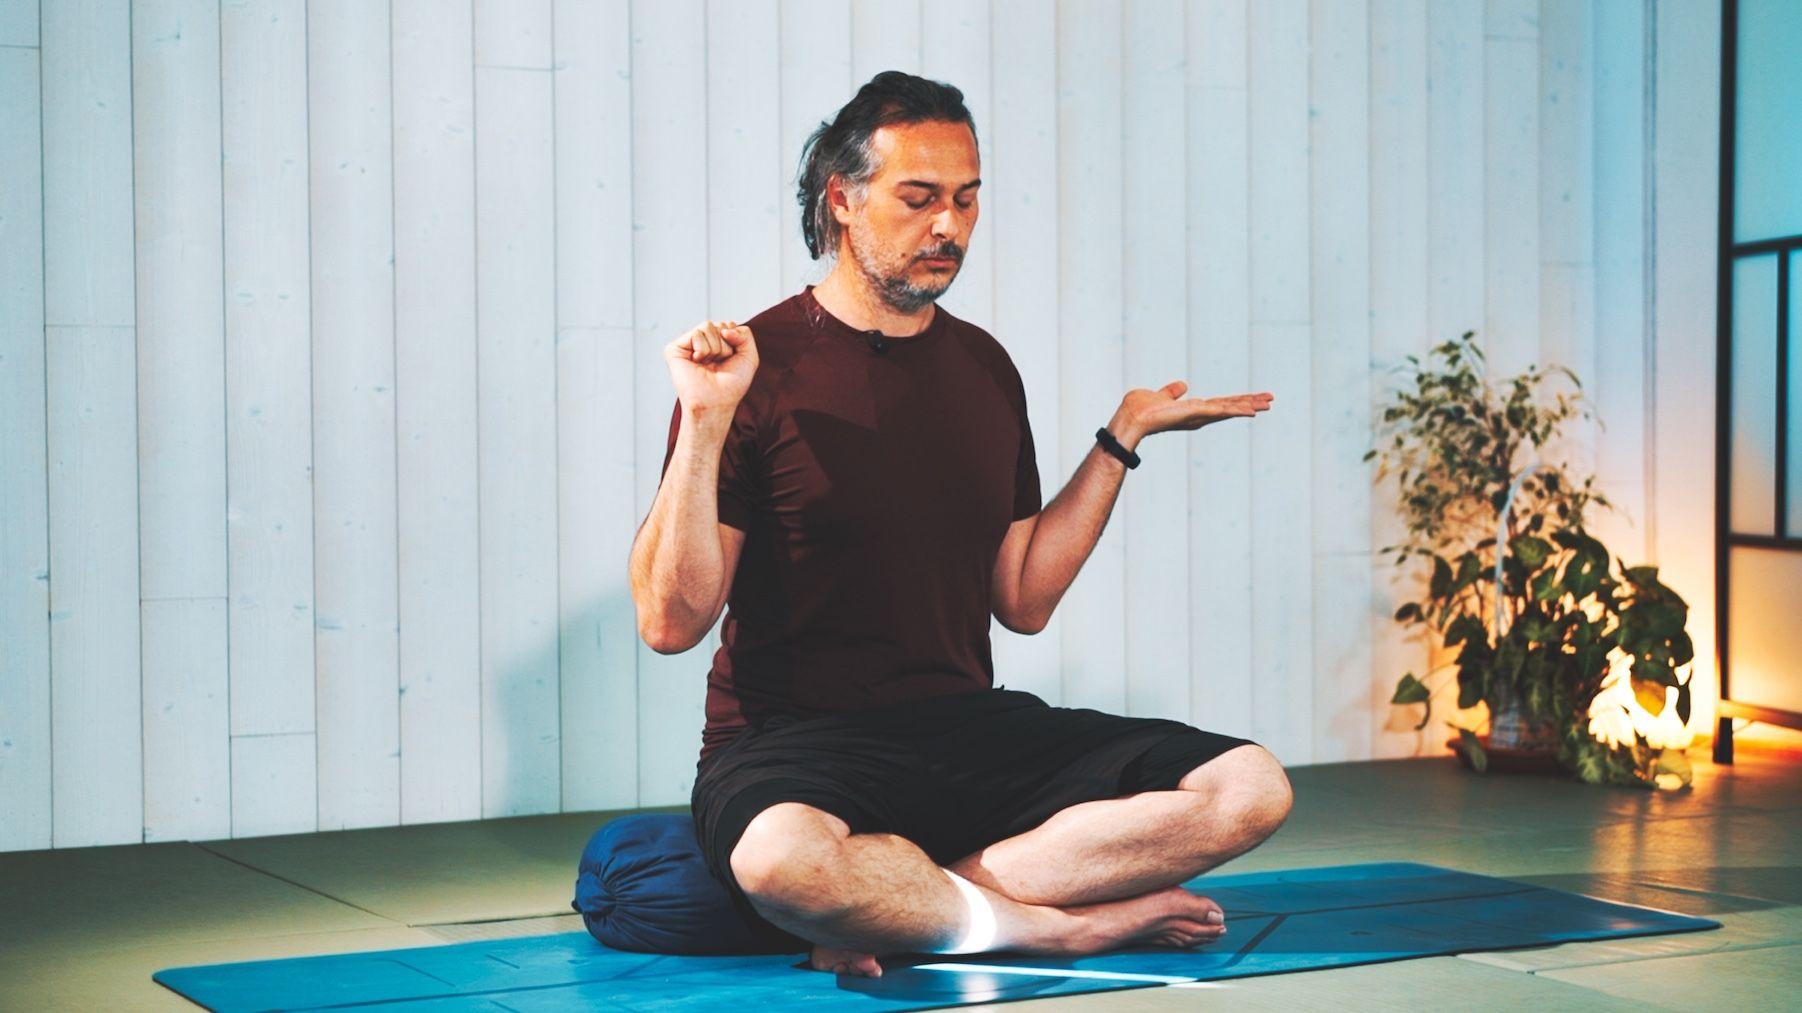 invocando un estado meditativo Kundalini Yoga